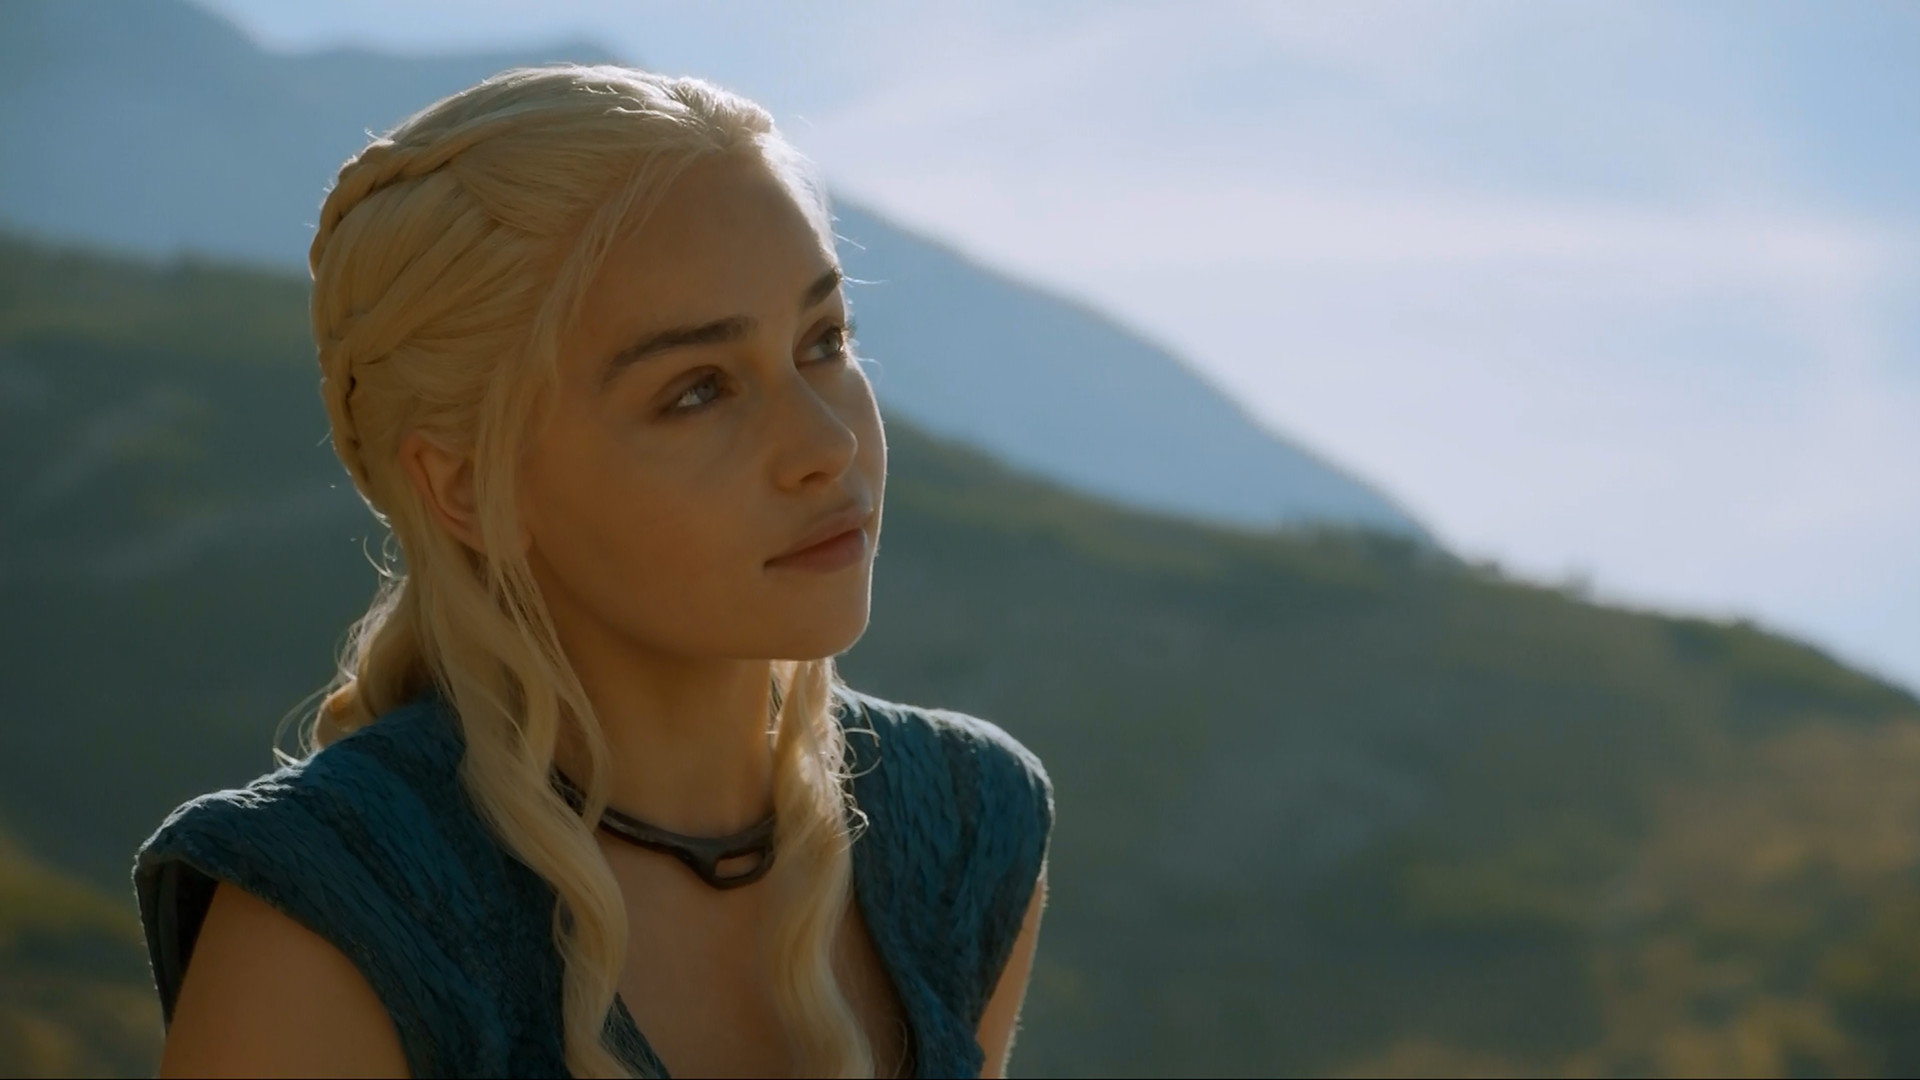 Daenerys Targaryen Wallpaper Hd 1080p Game Of Thrones - Daenerys Targaryen Game Of Thrones Desktop - HD Wallpaper